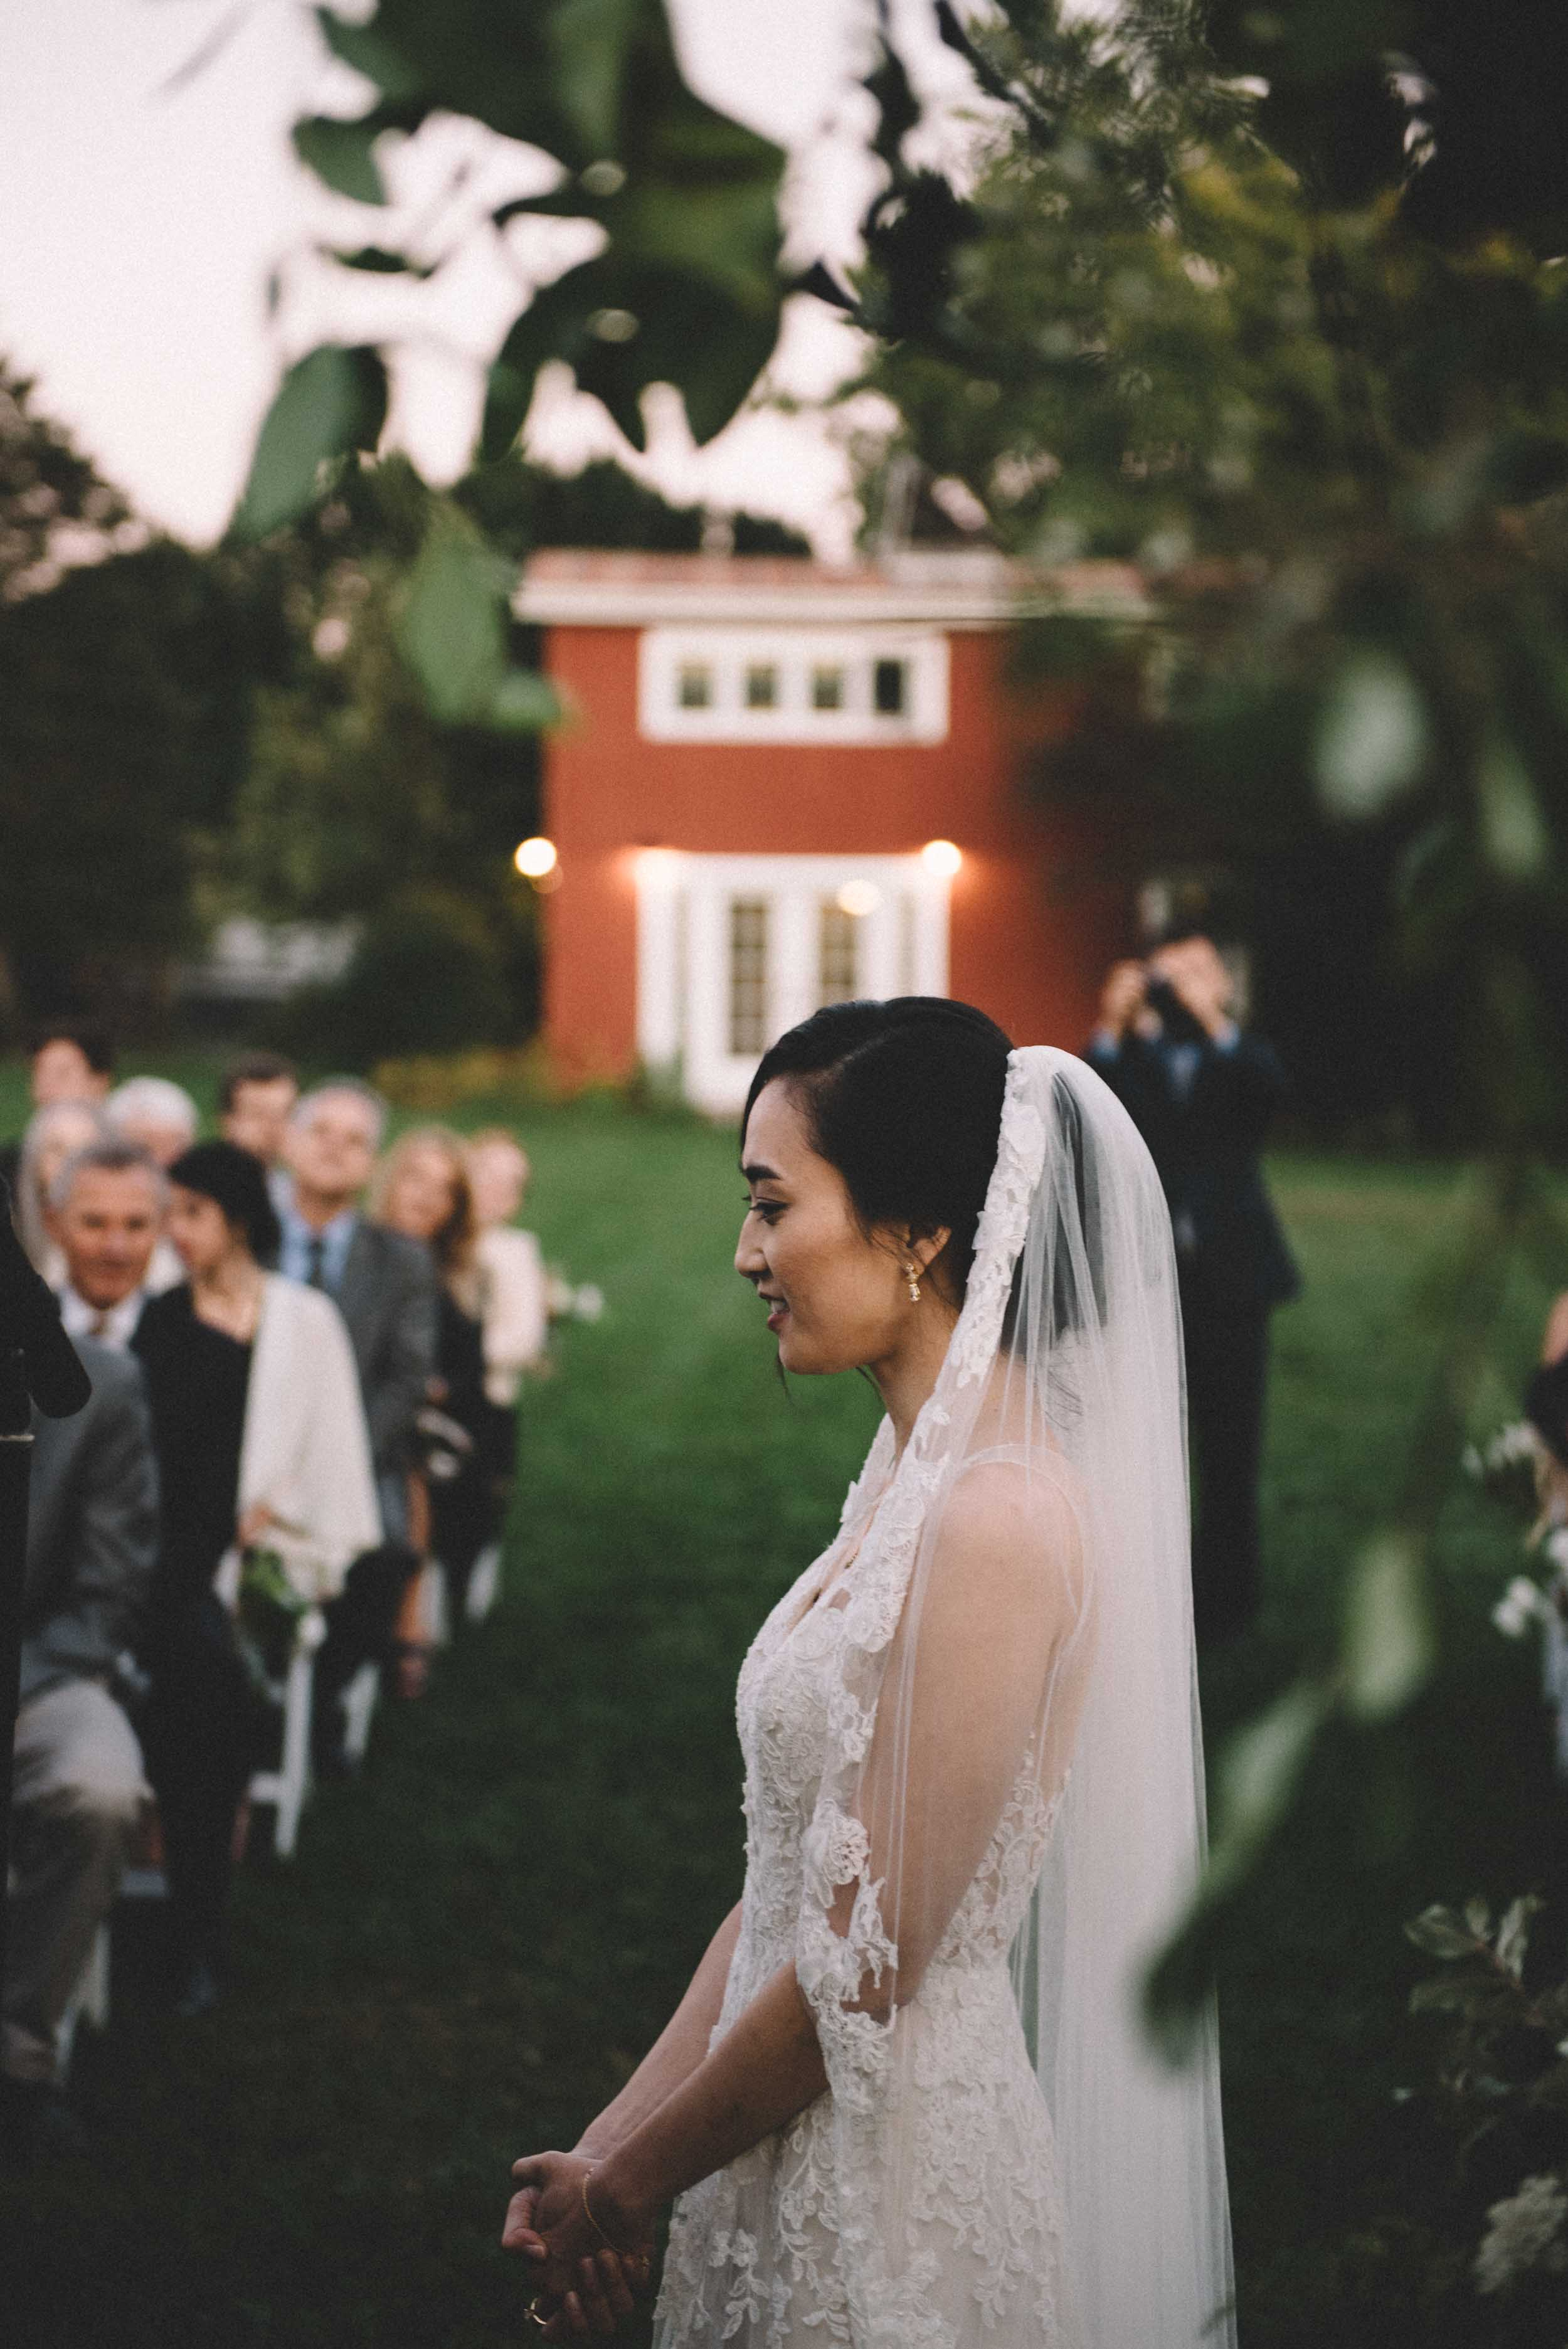 poolseville-maryland-wedding-photographer-44.jpg